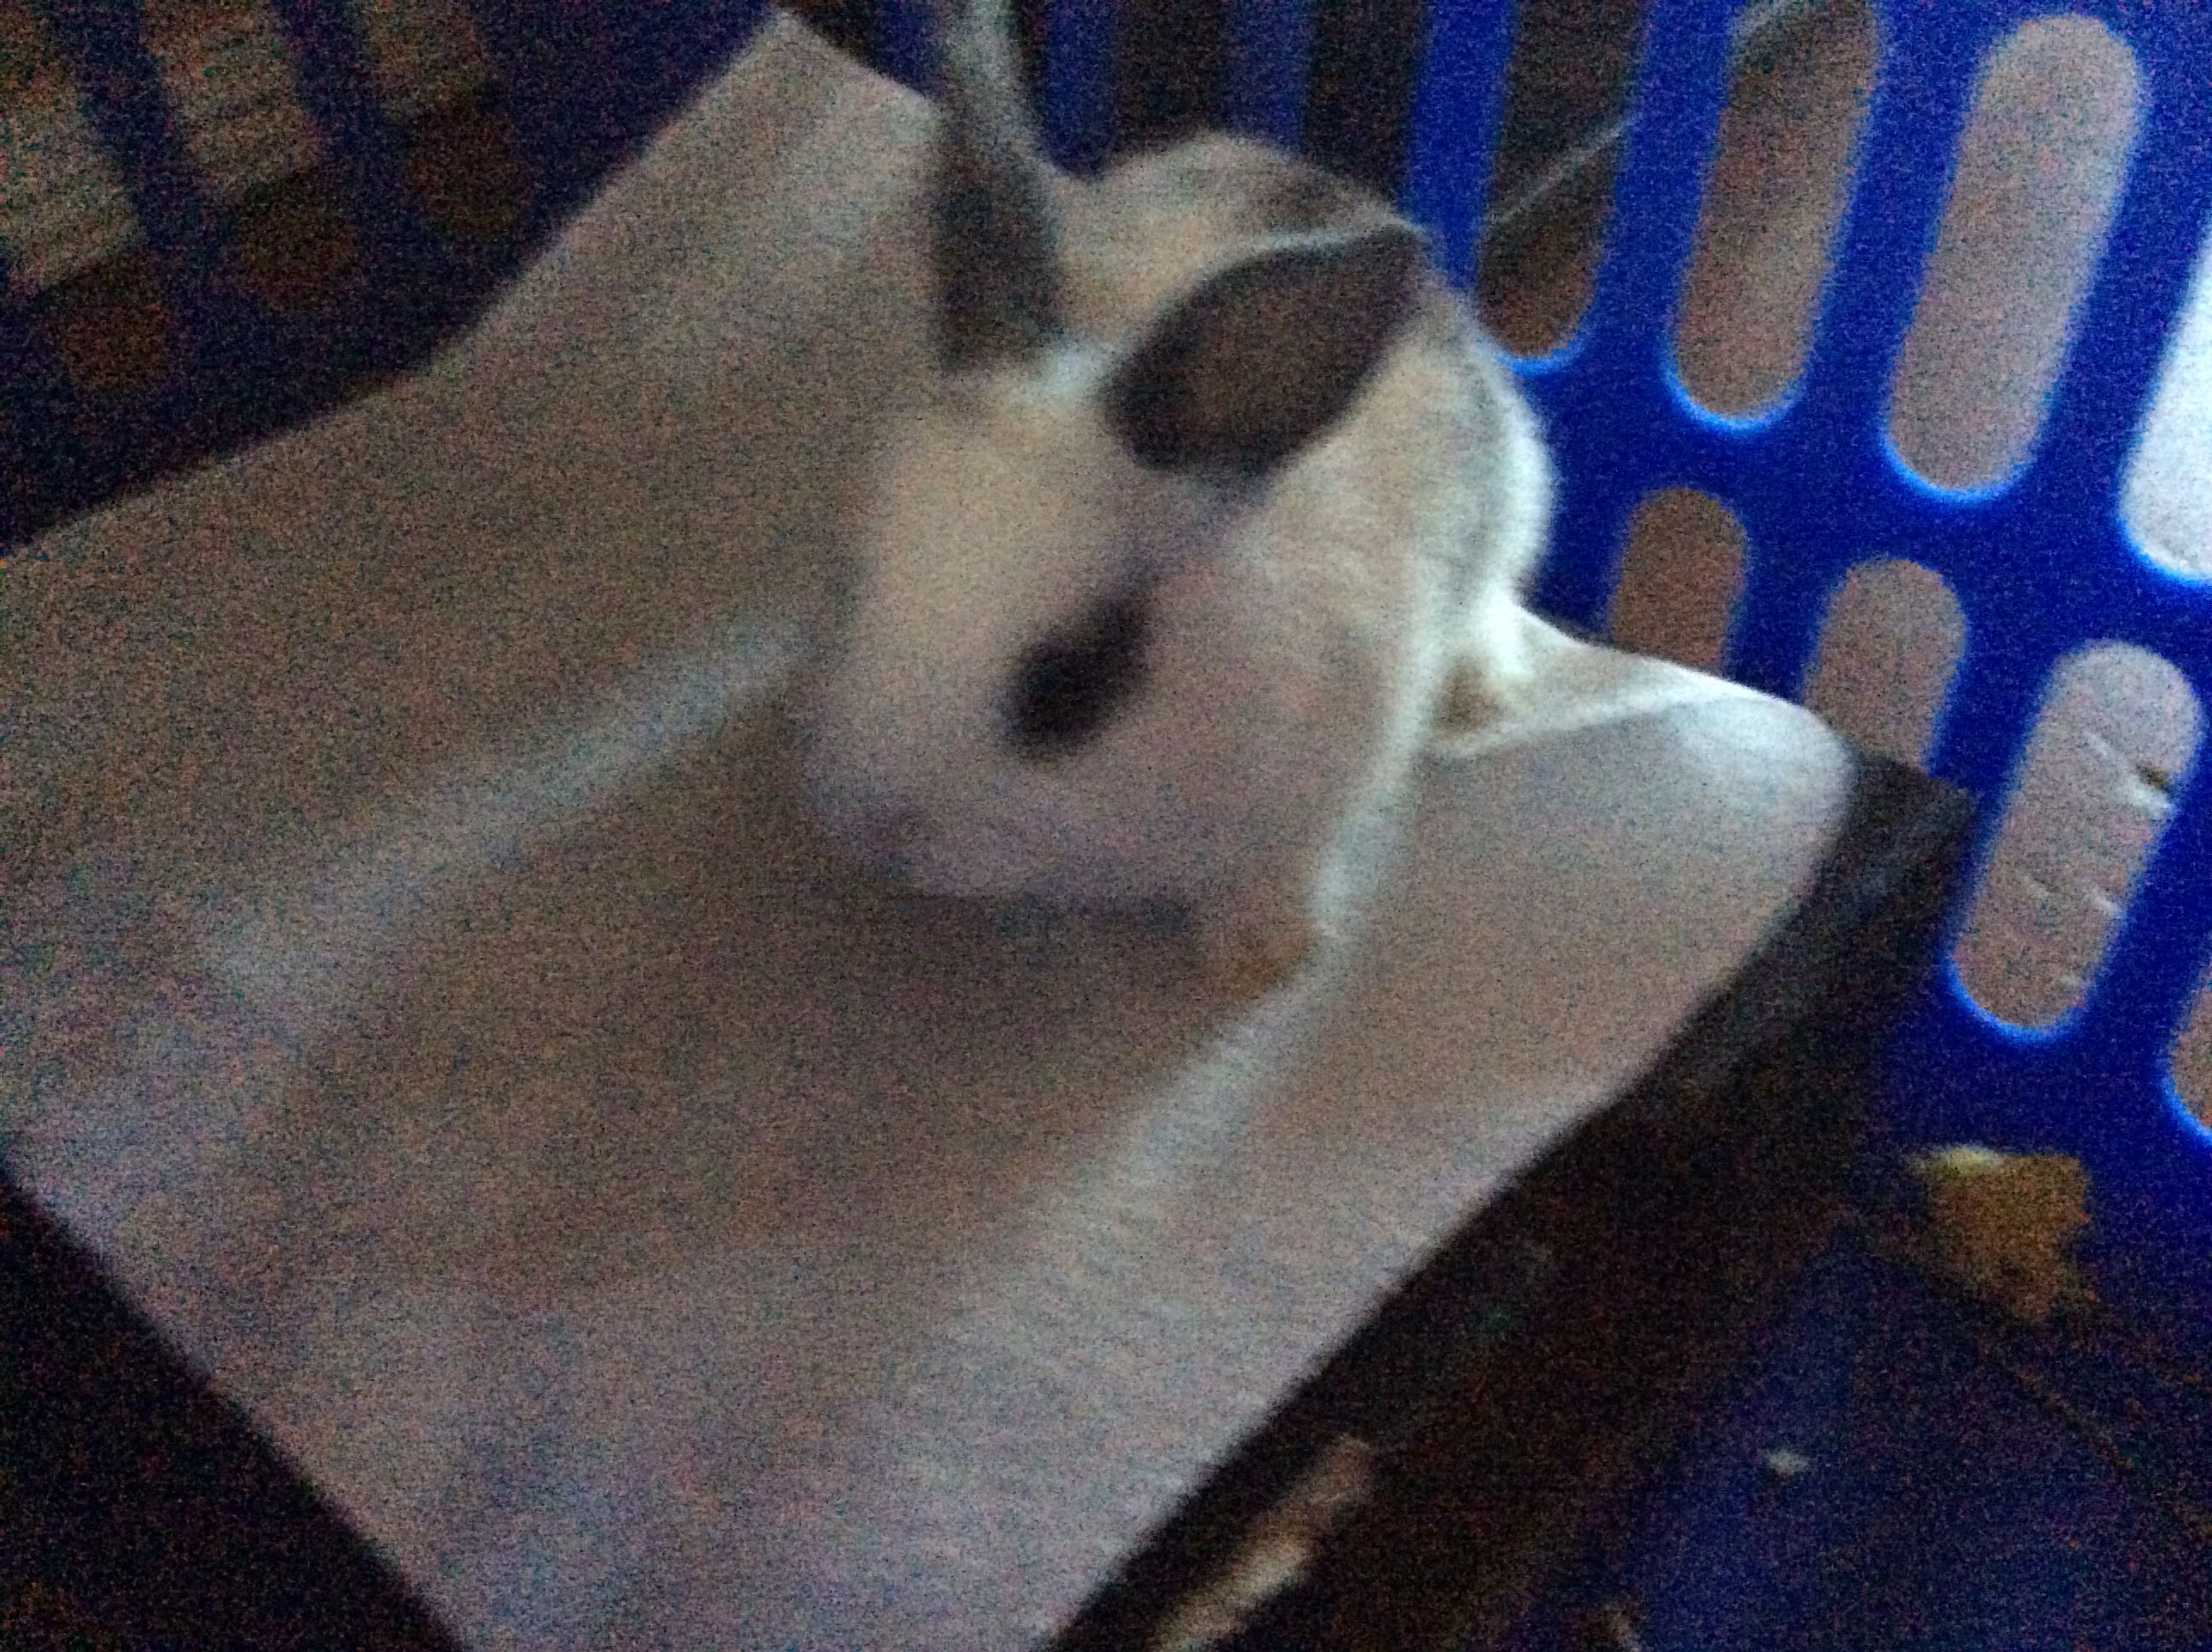 My new cute baby rabbit